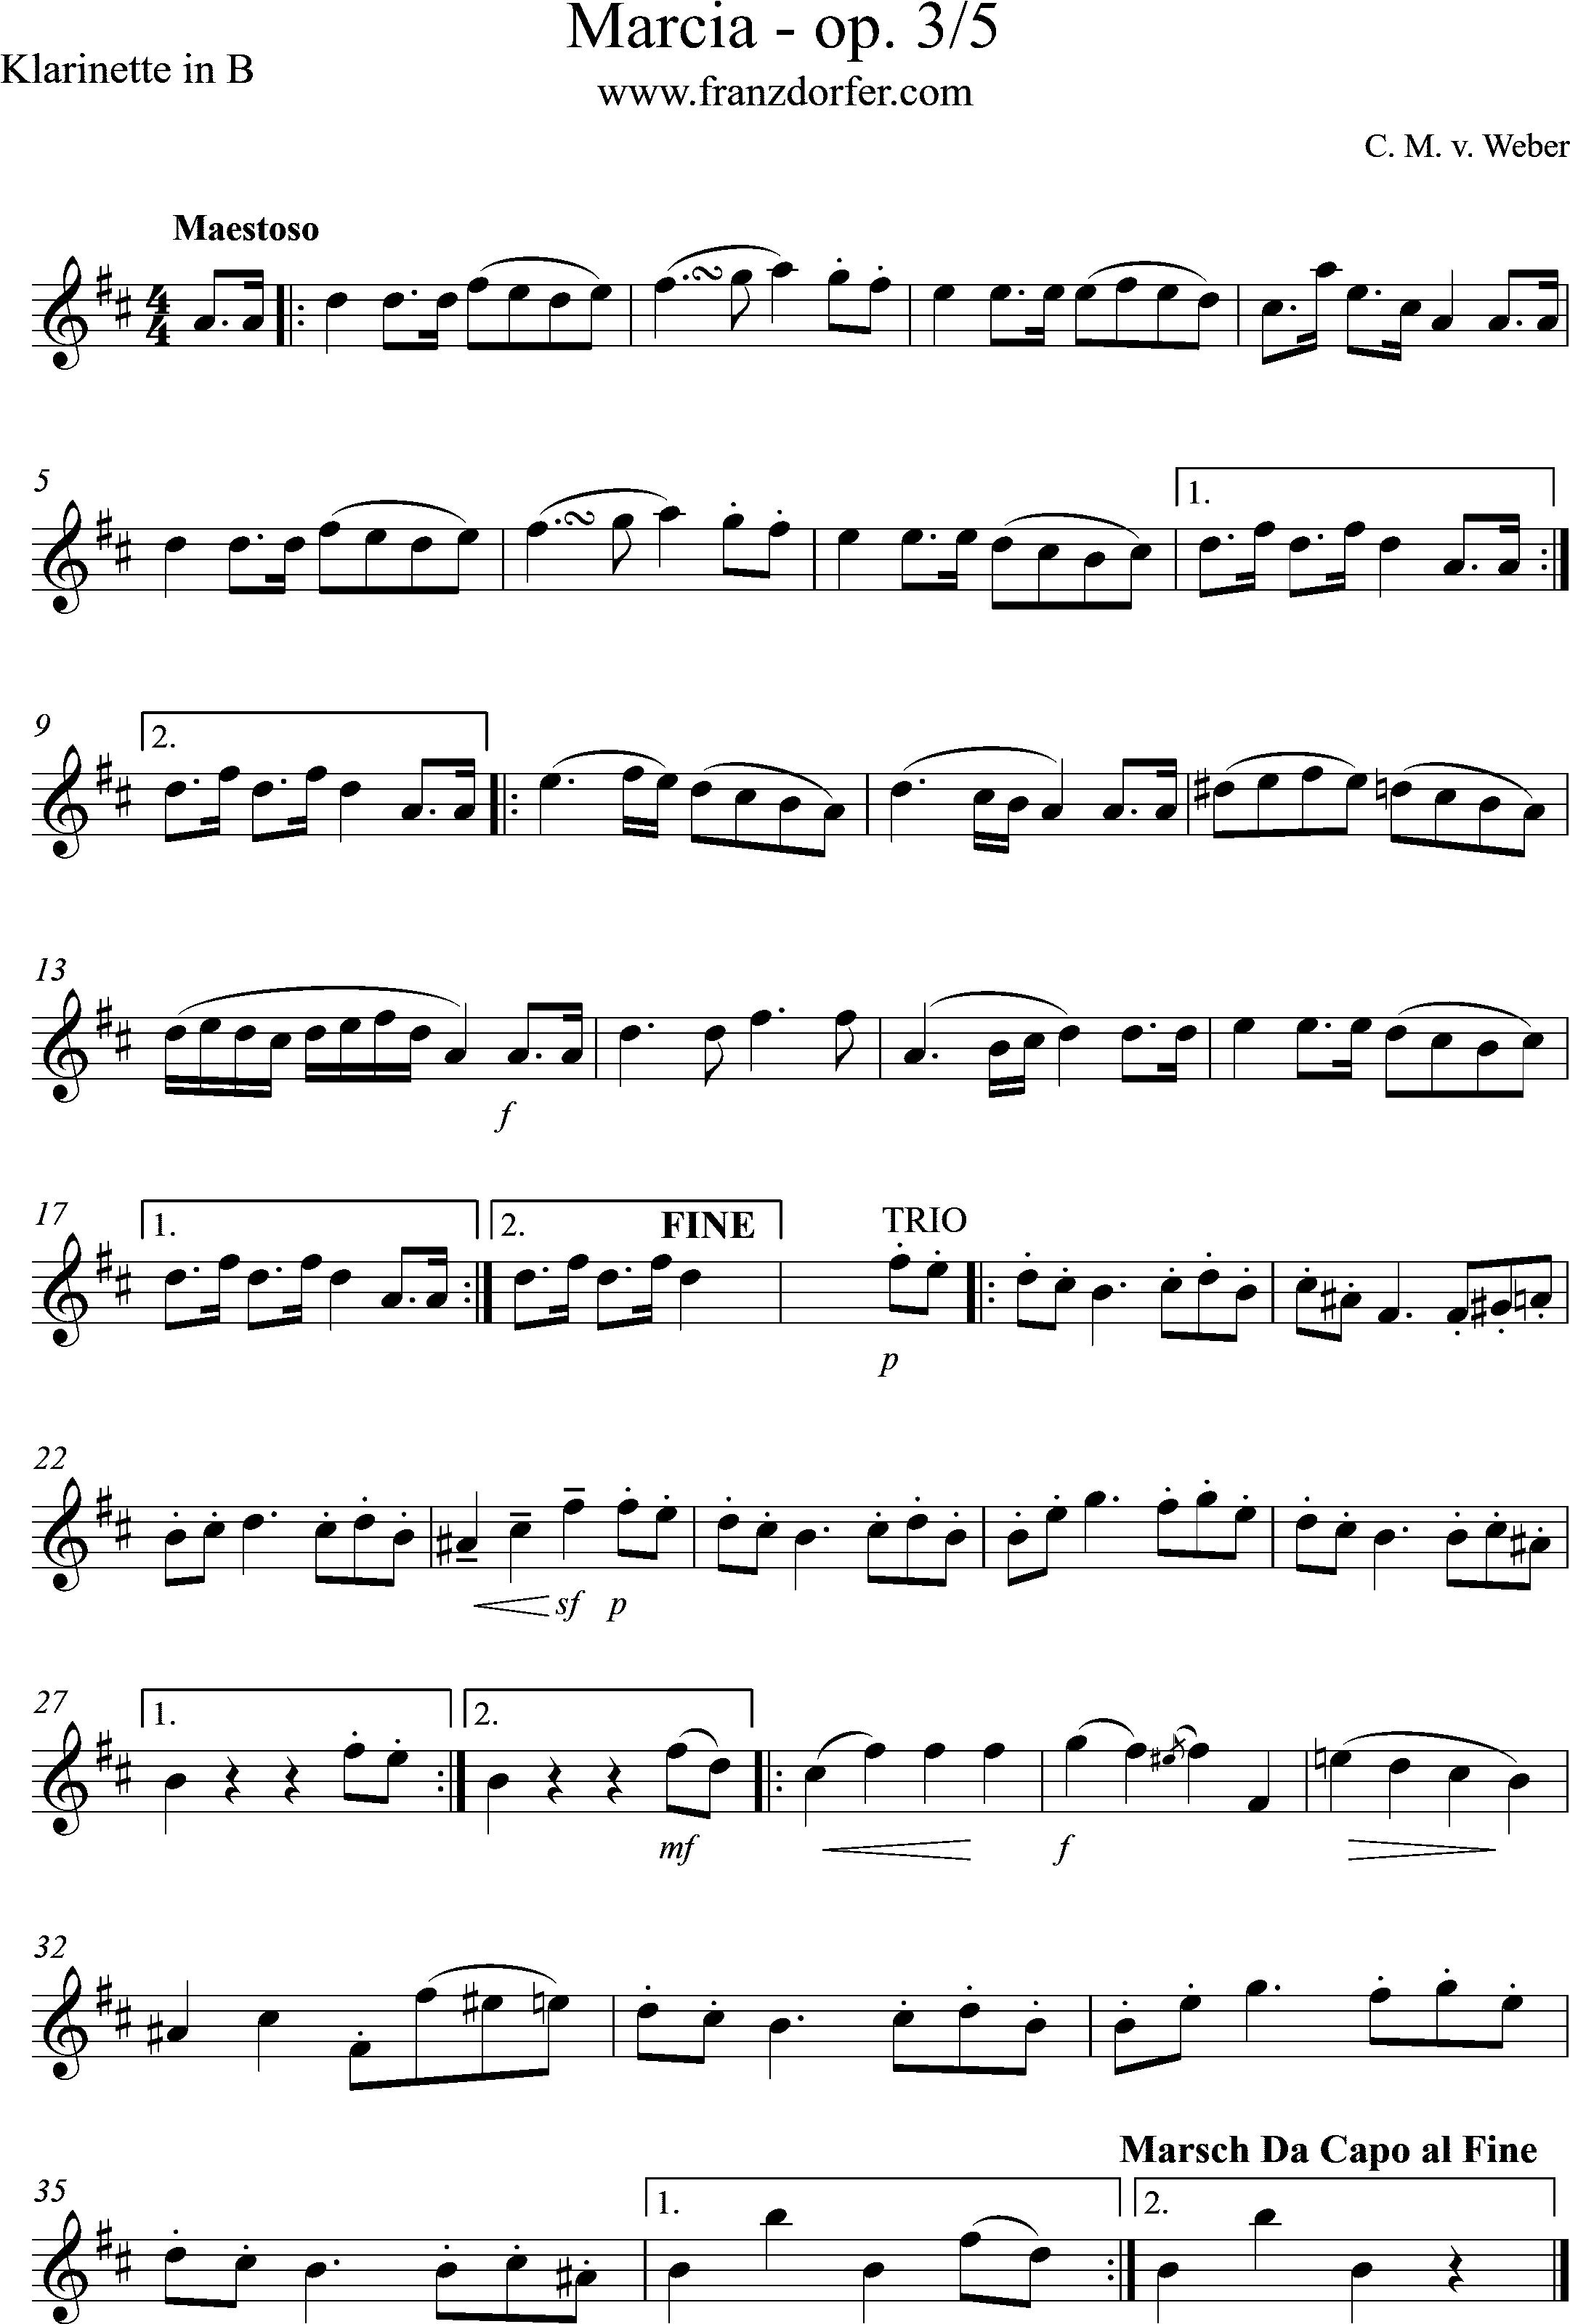 klarinettennoten - Marcia Weber